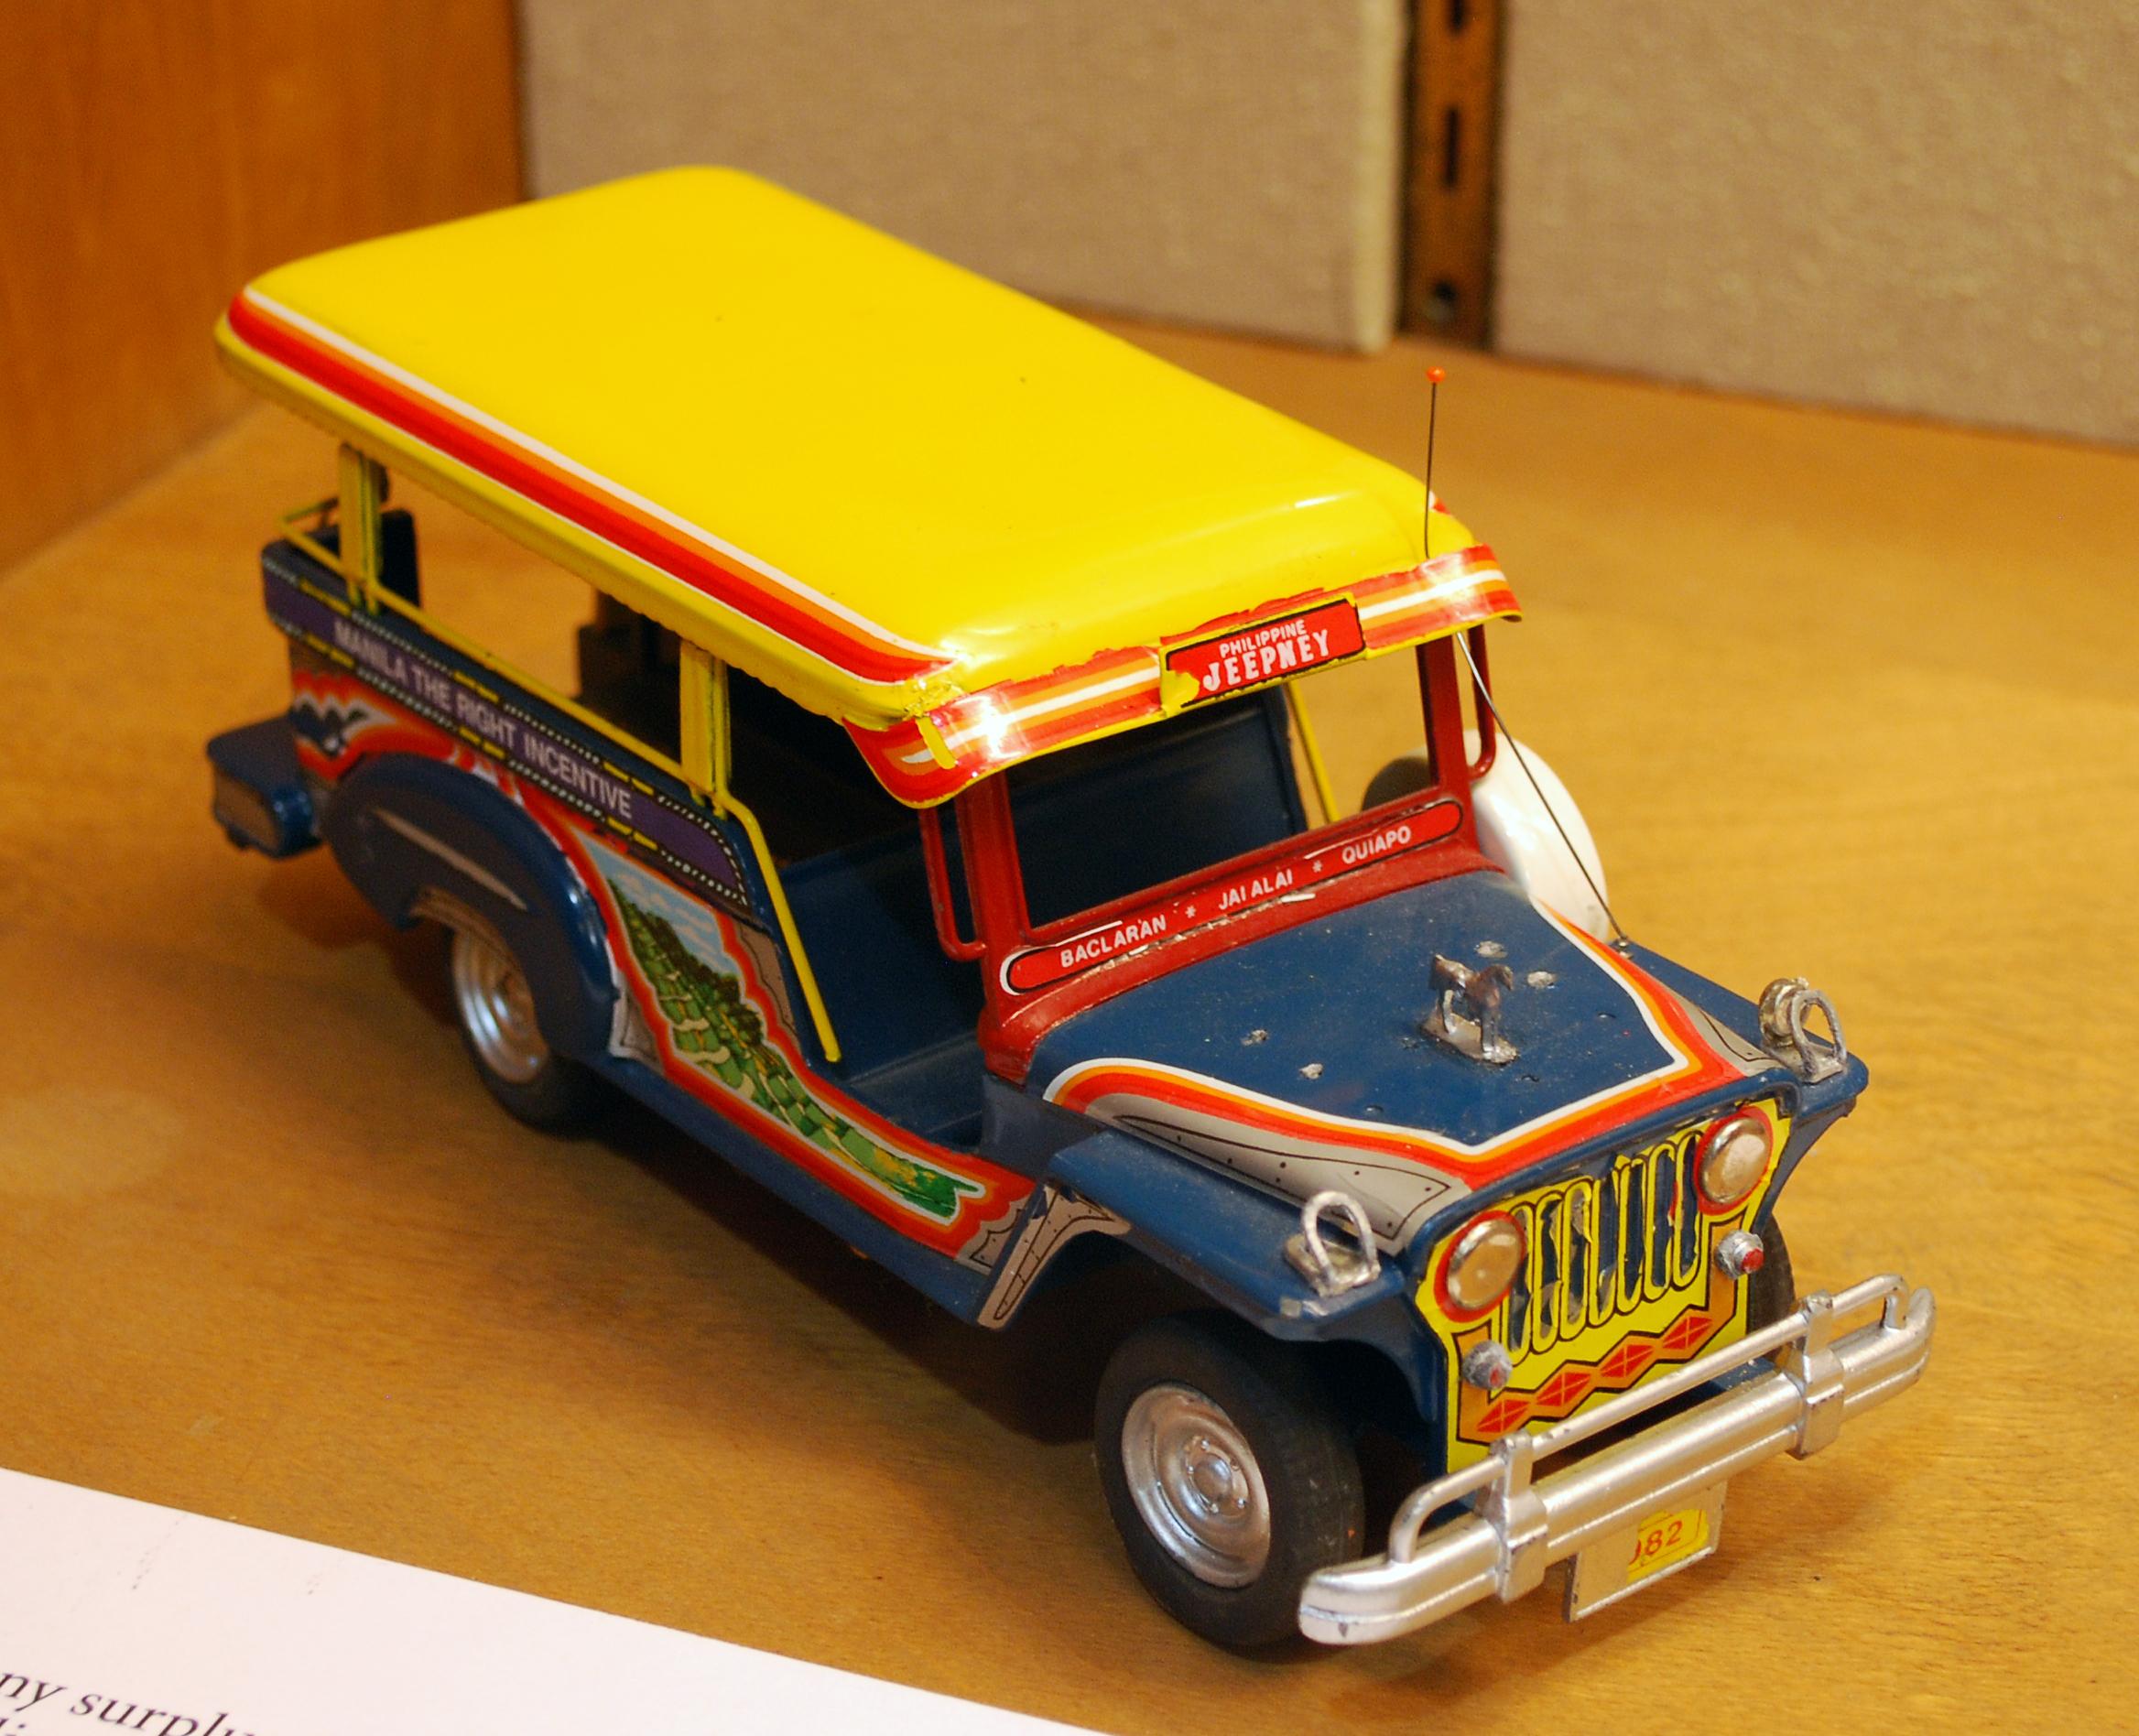 Object: Toy (Filipino Jeepney Bus)   UTSA Institute Of Texan Cultures